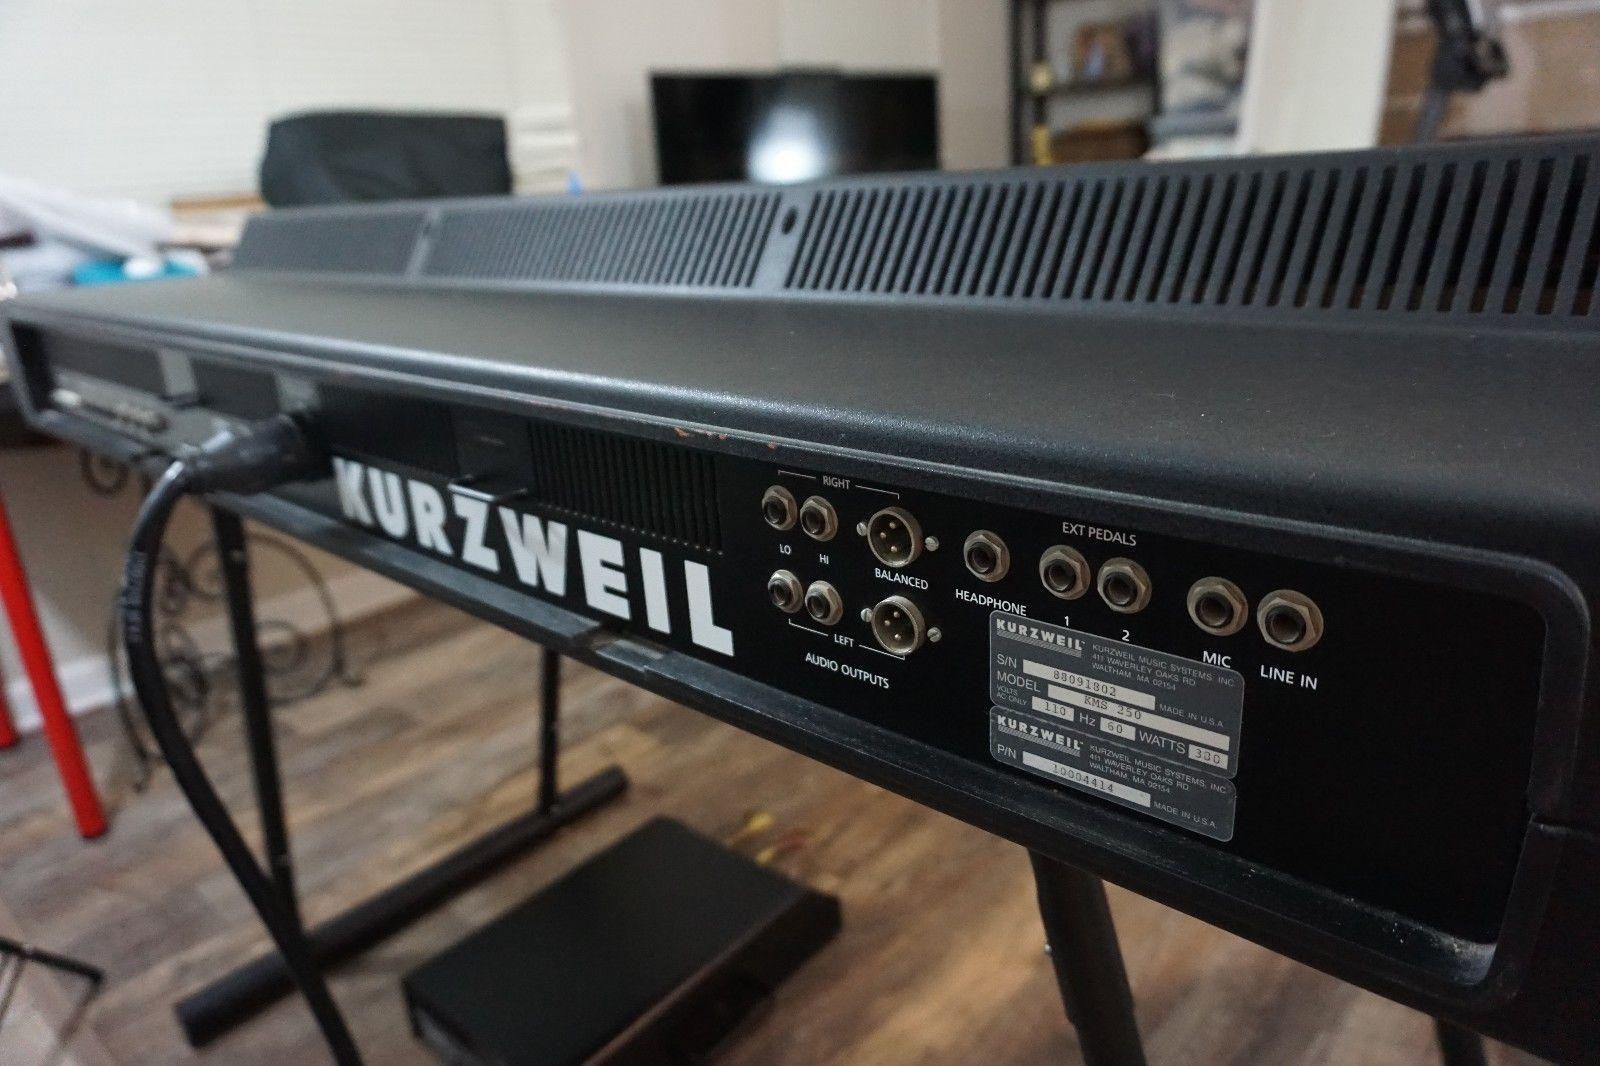 Kurzweil k250 | Music | Marshall speaker, Keyboard, Bose